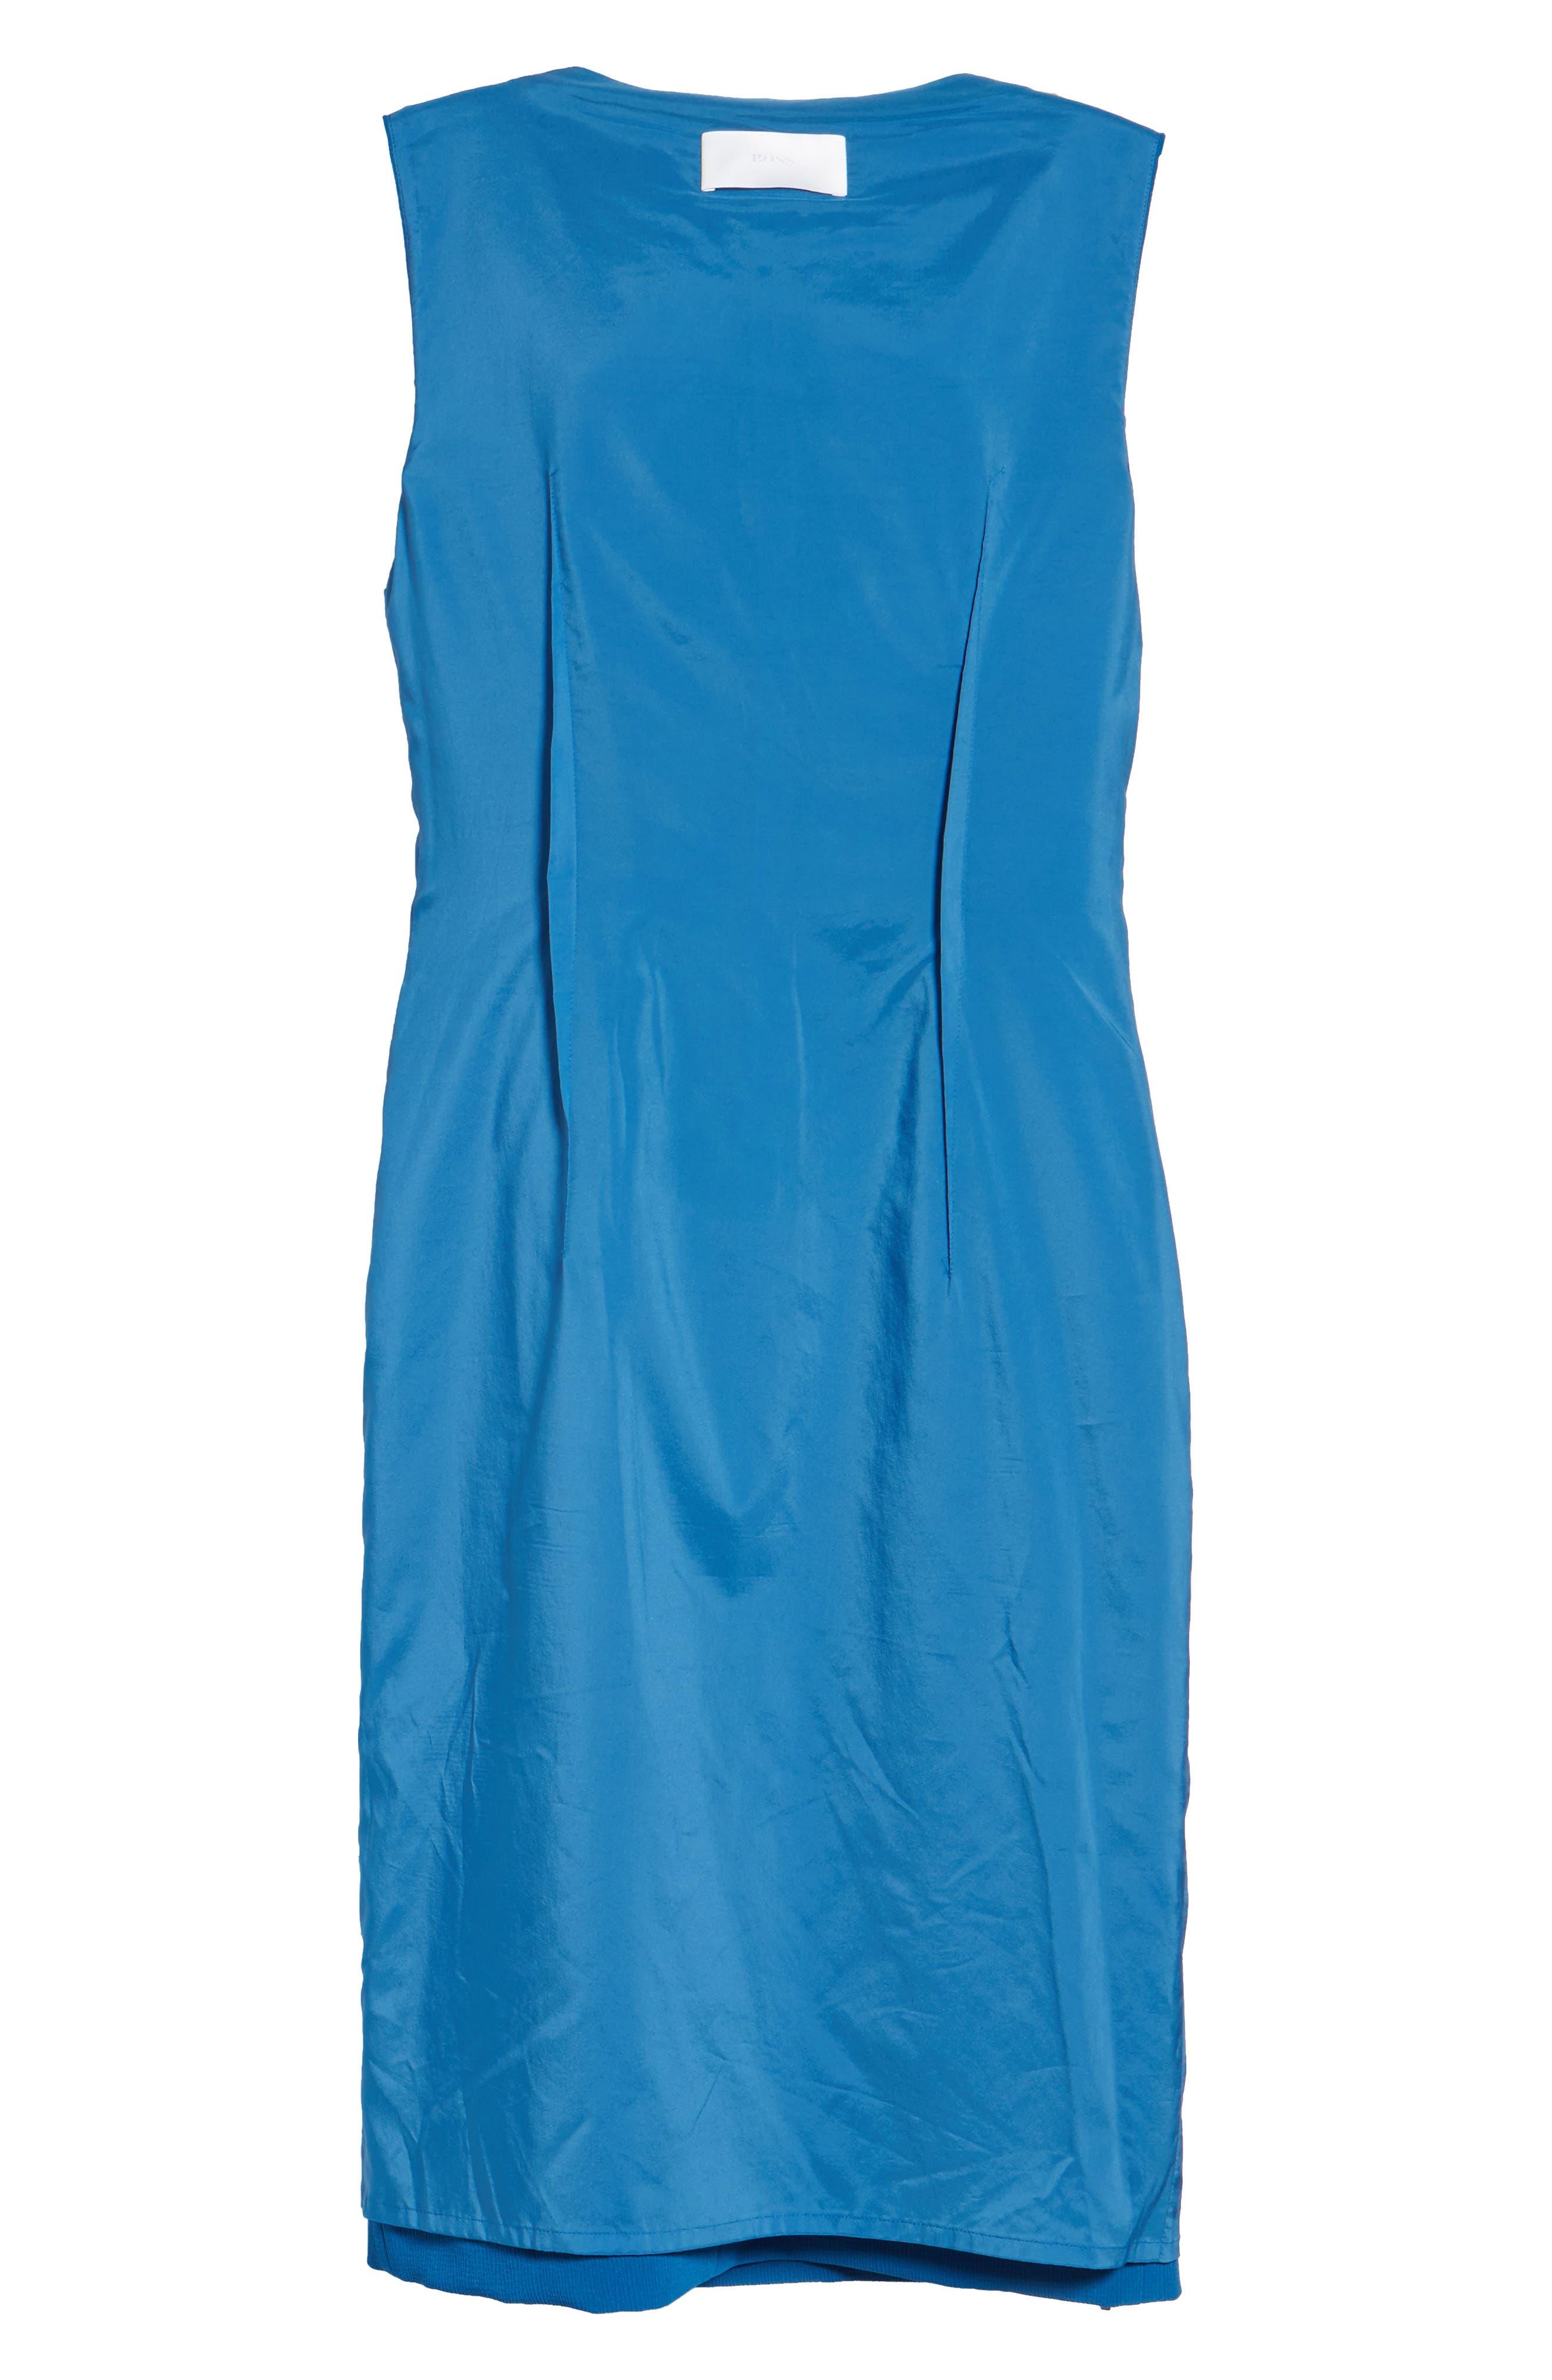 Danafea Zip Detail Sheath Dress,                             Alternate thumbnail 6, color,                             424